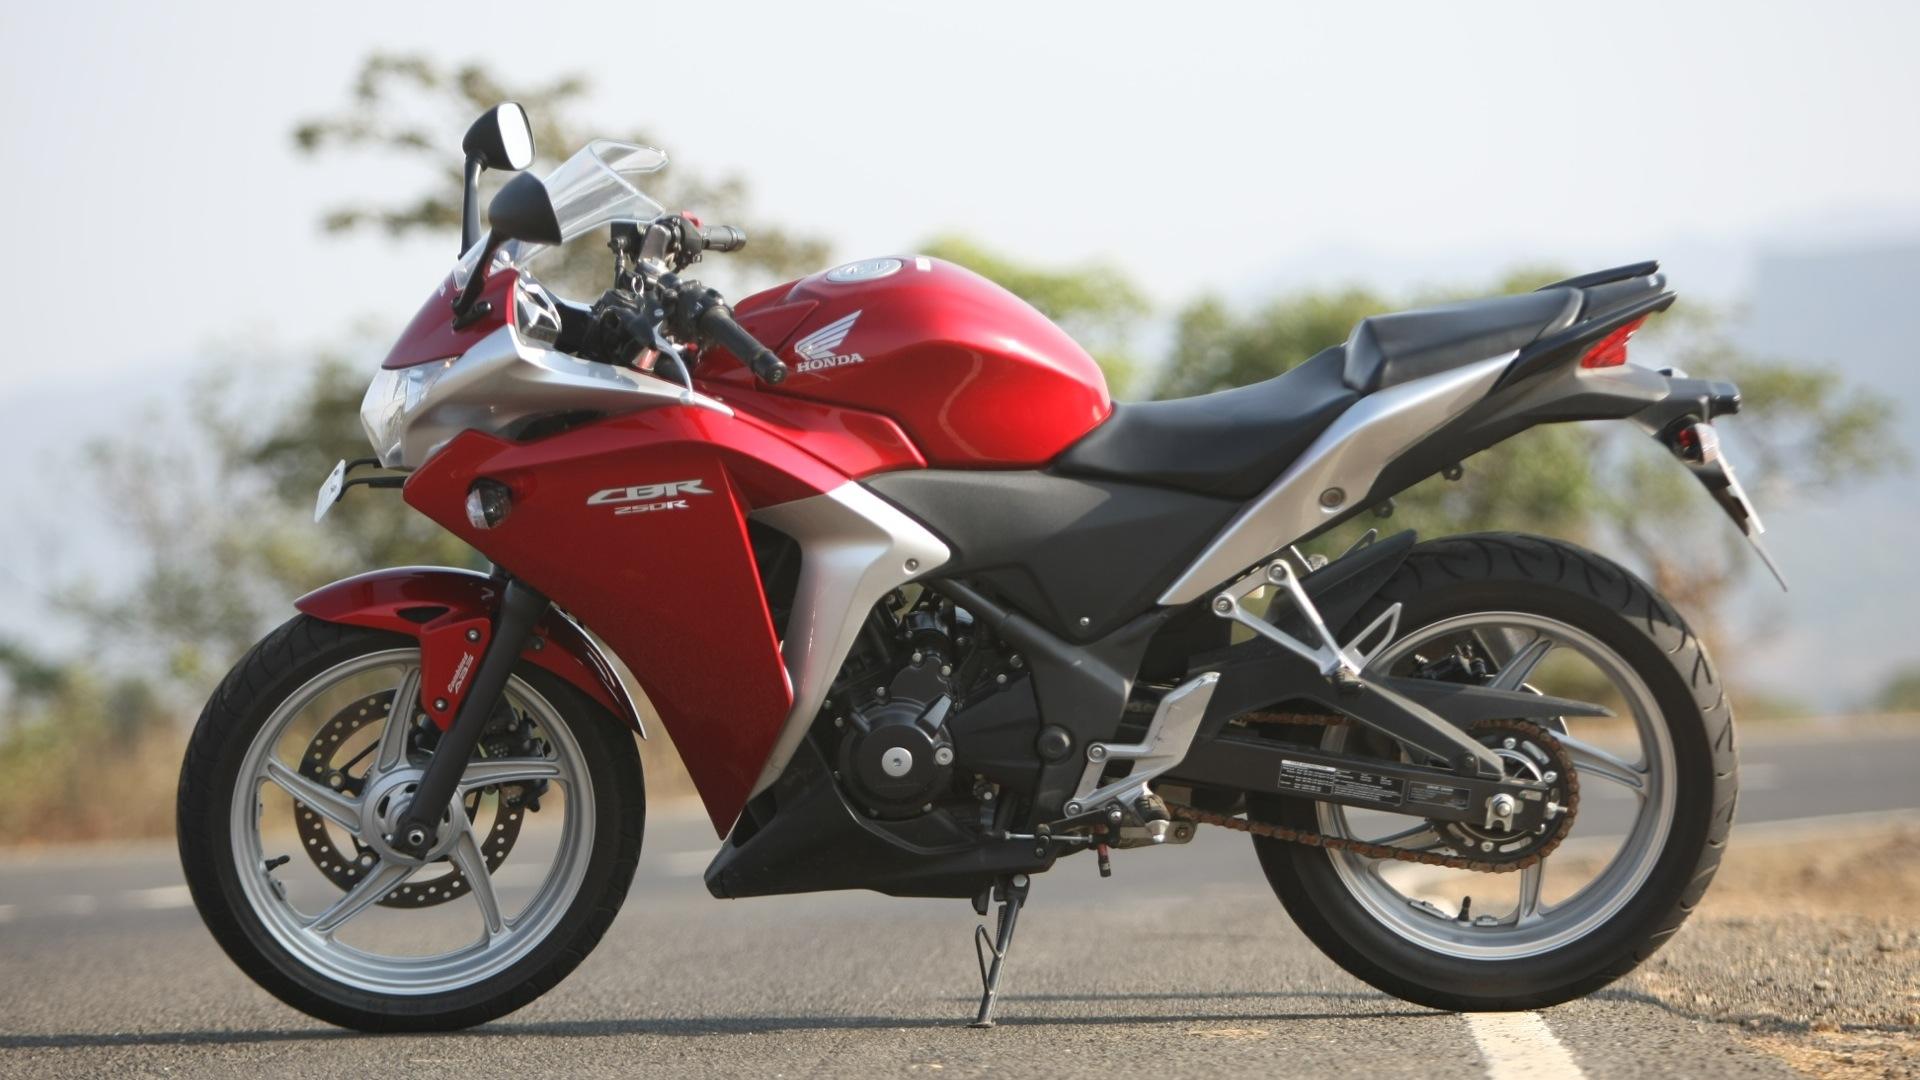 Honda cbr250r 2016 c abs price mileage reviews for Honda cbr250r top speed